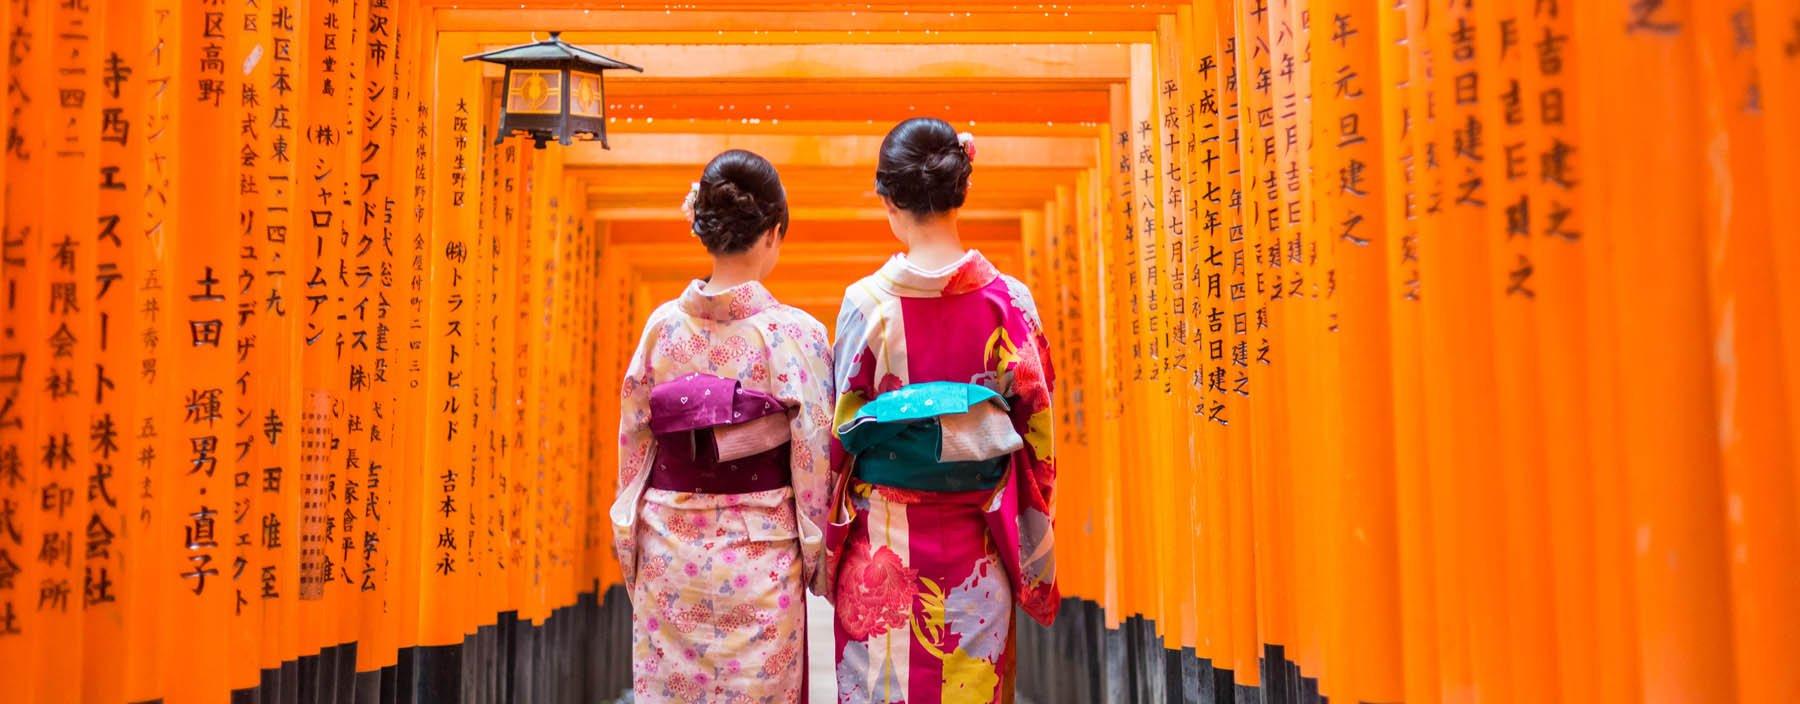 jp, kyoto, red wooden tori gate at fushimi inari shrine.jpg